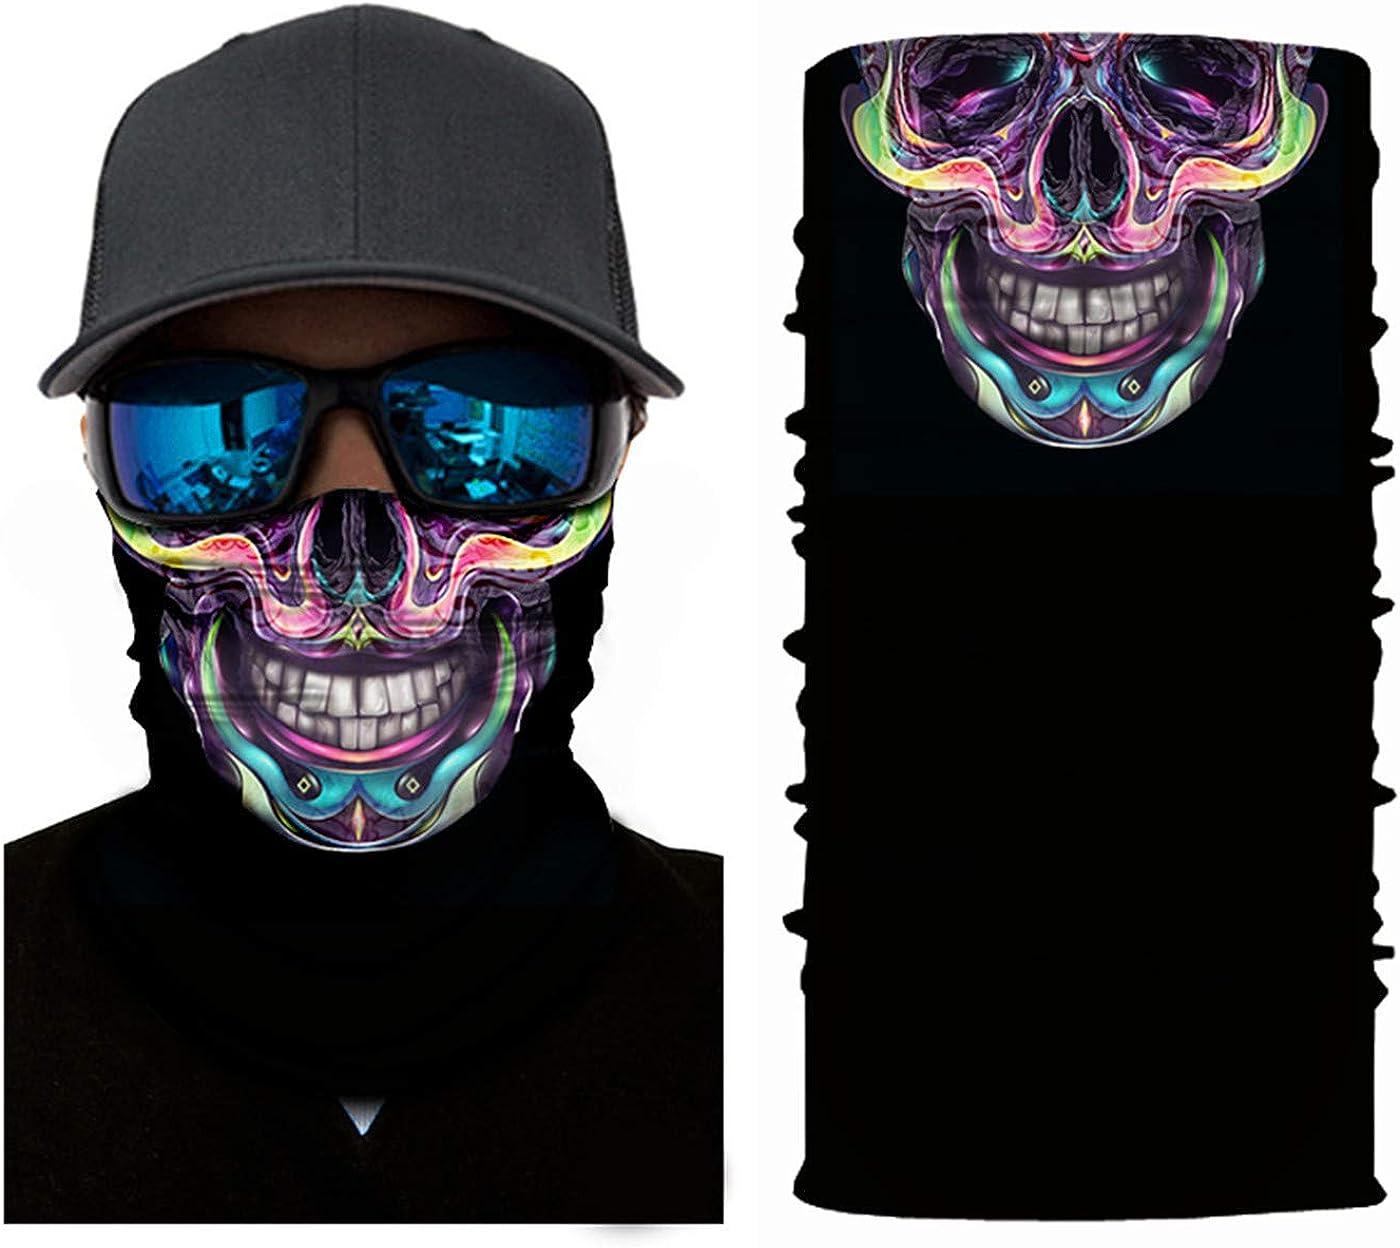 3D Balaclava Moto Pasamontañas Calavera Multifuncional Bufanda Prueba de Viento Microfibra Elástico Pañuelos Cabeza Bandana Calavera Ciclismo Bici Máscara Facial Protección UV Esquí Cintas de Pelo